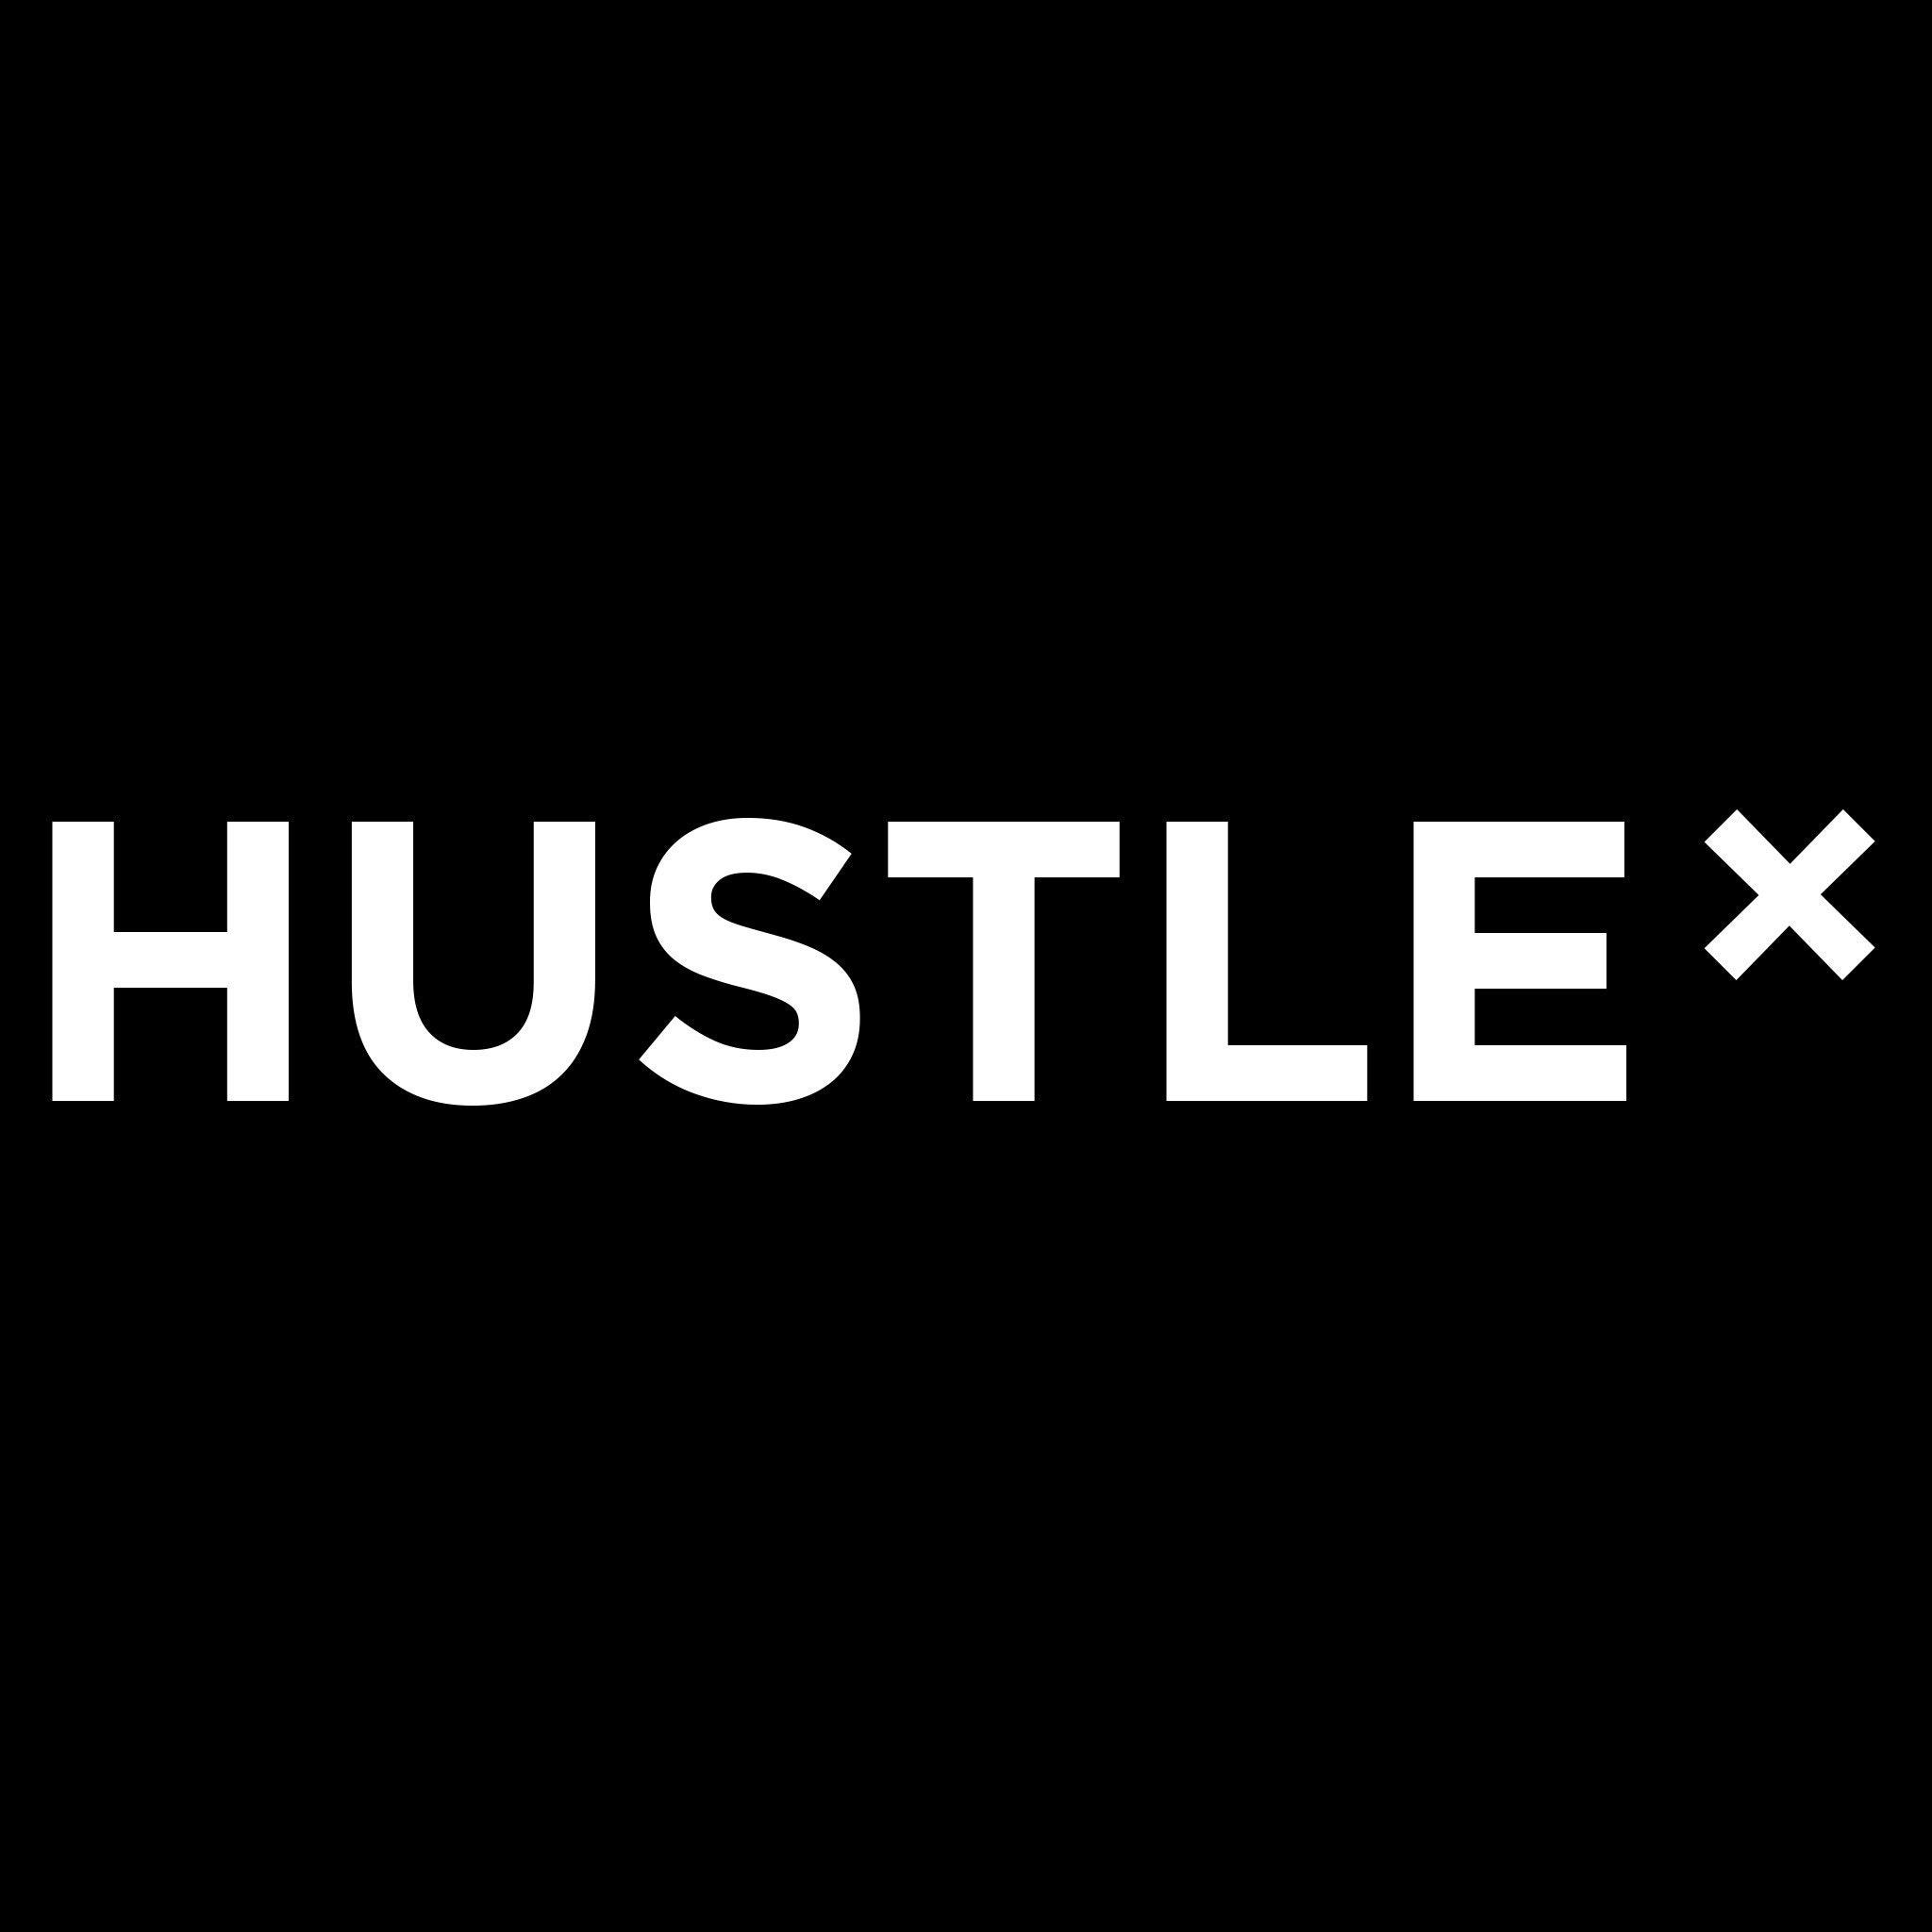 Hustle X